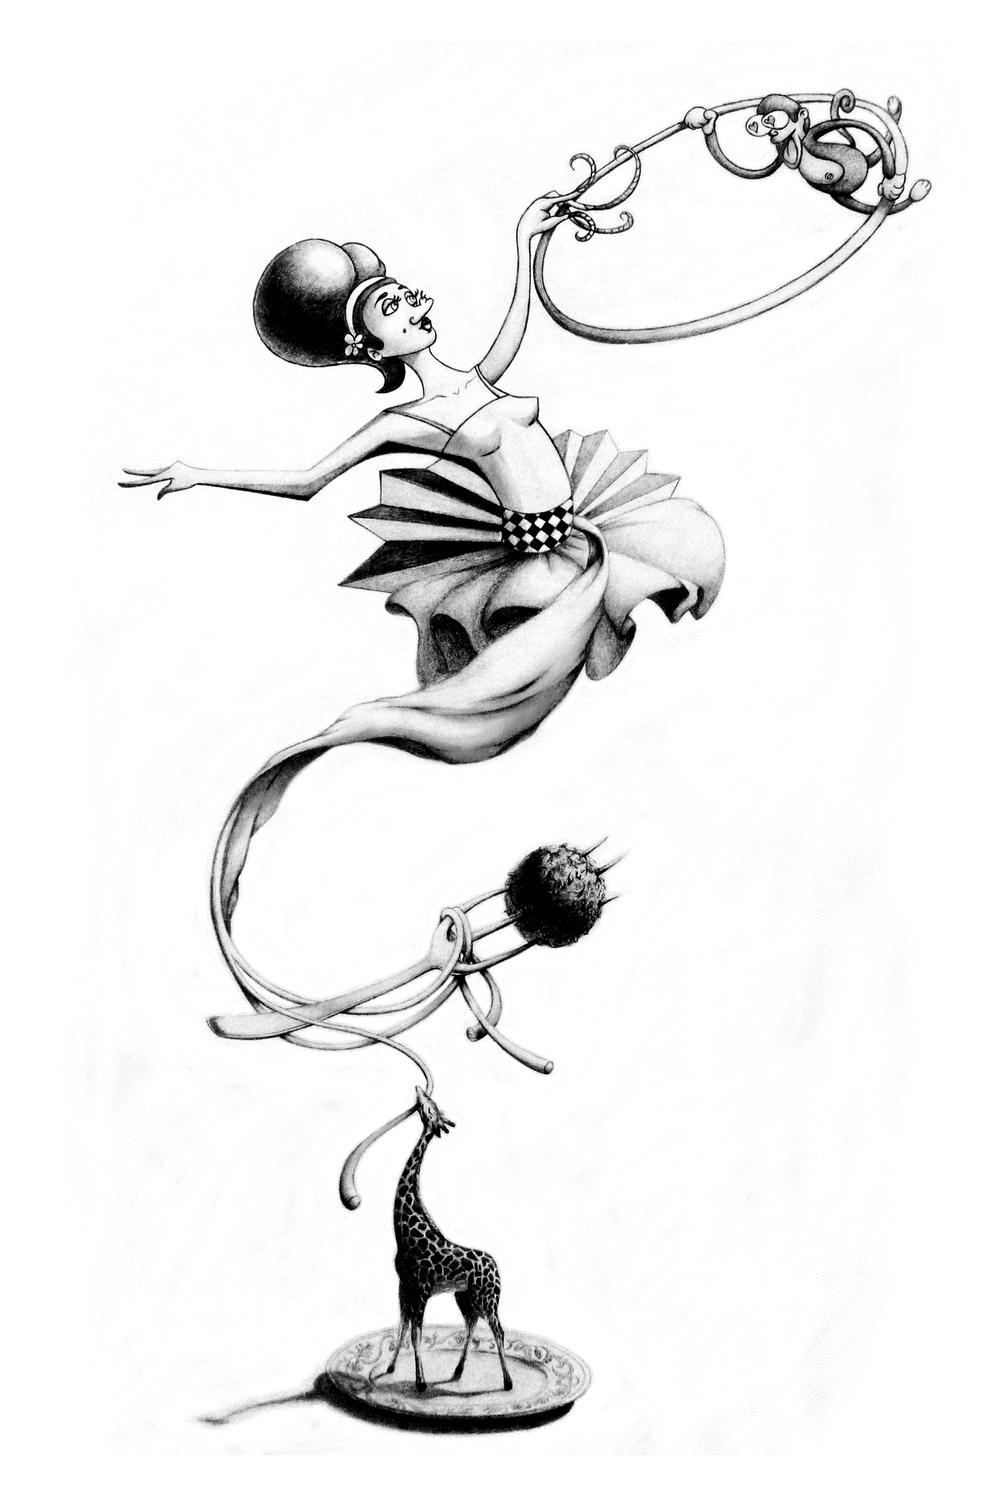 Spaghetti Dancer